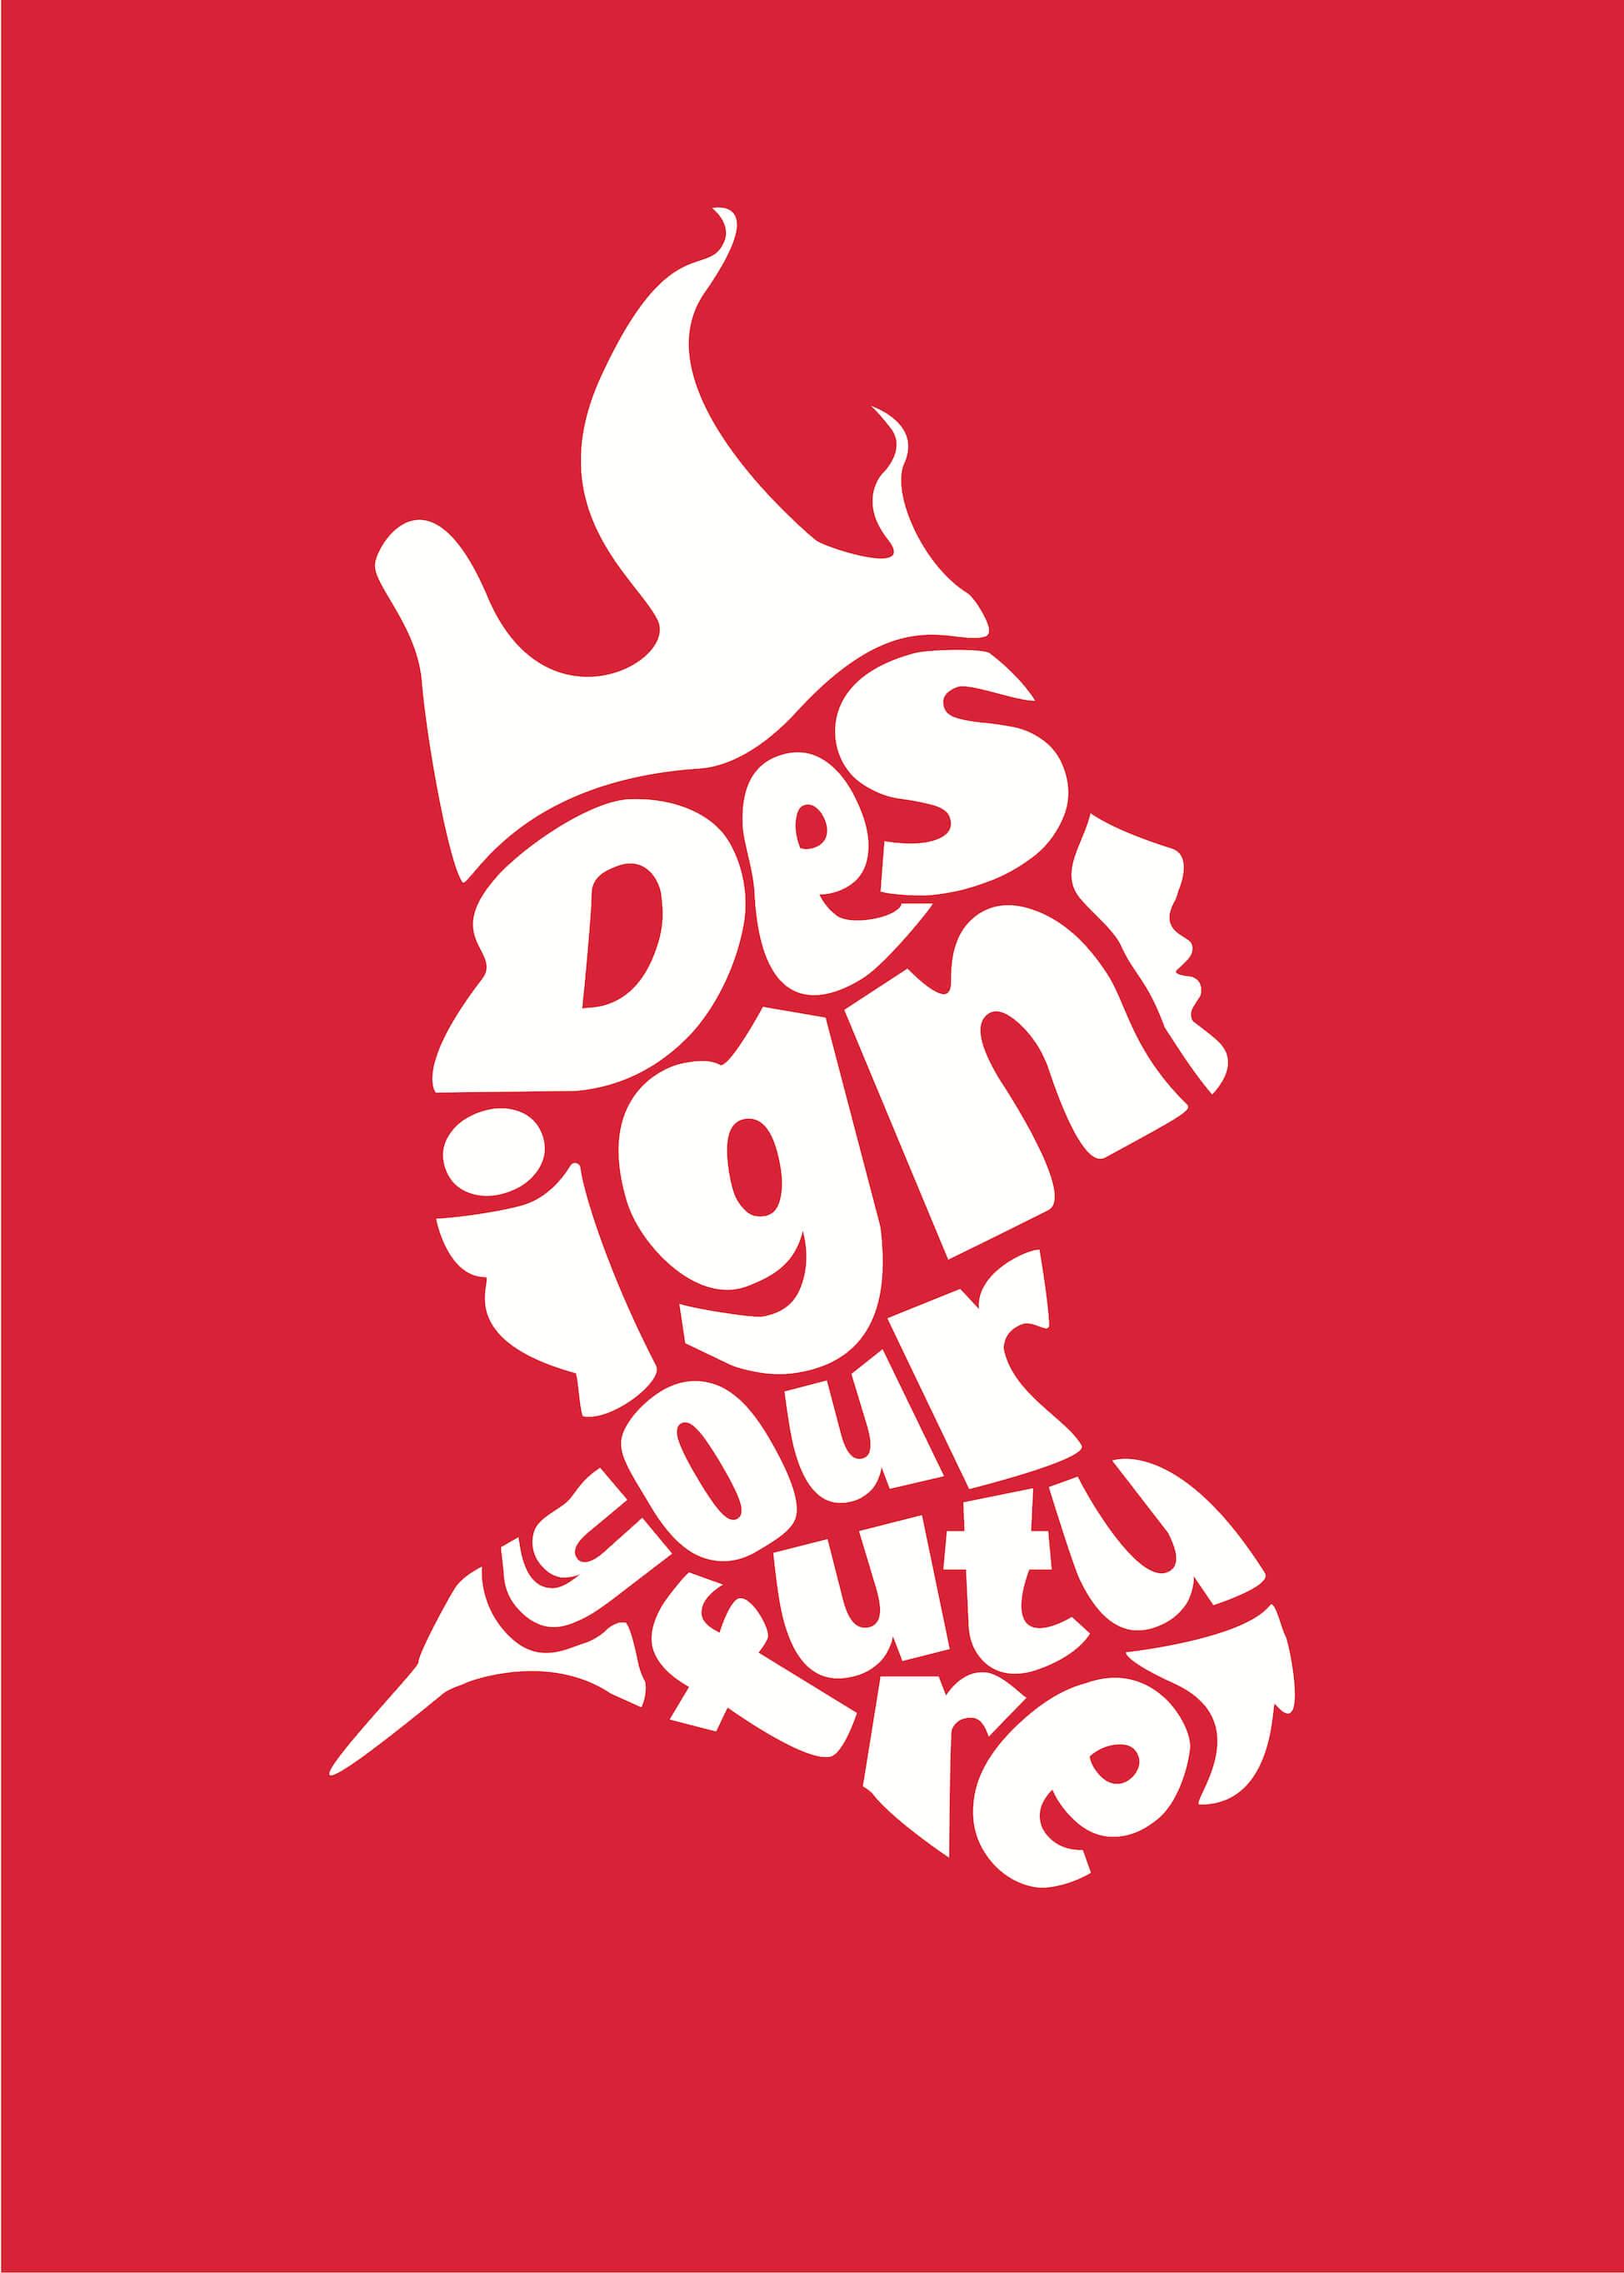 Design Your Future main image